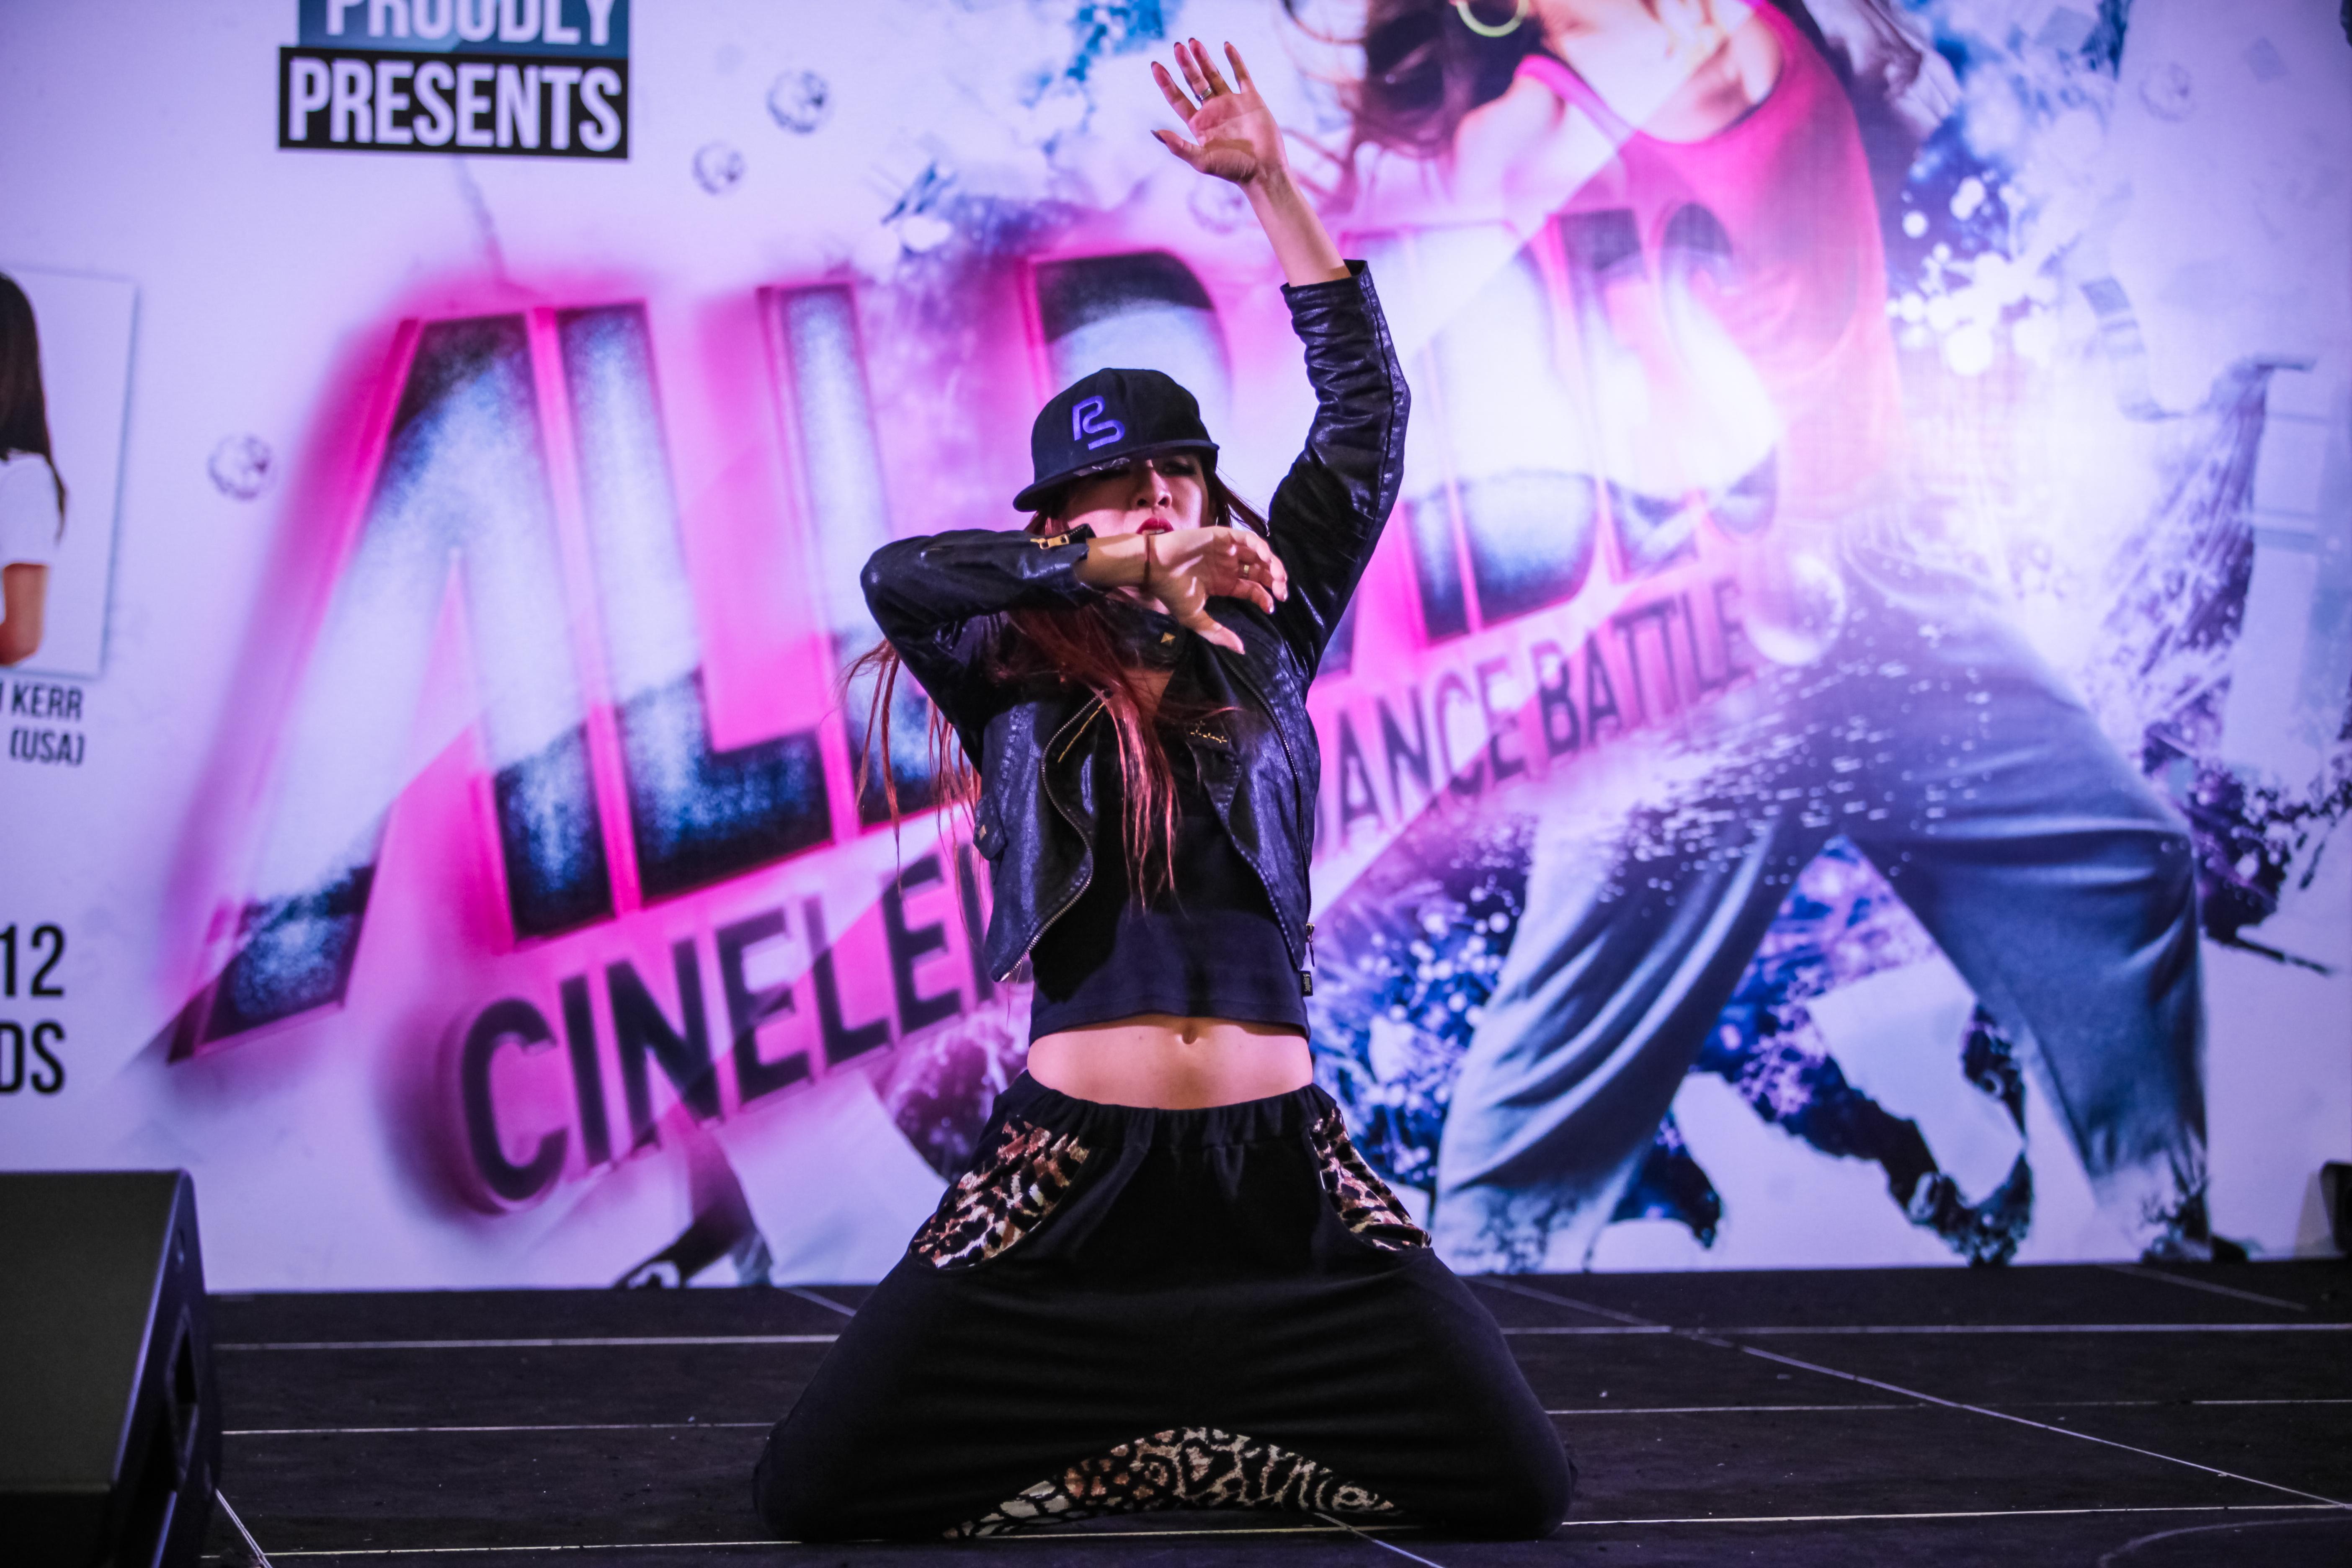 ABDC Dance Finals 2012